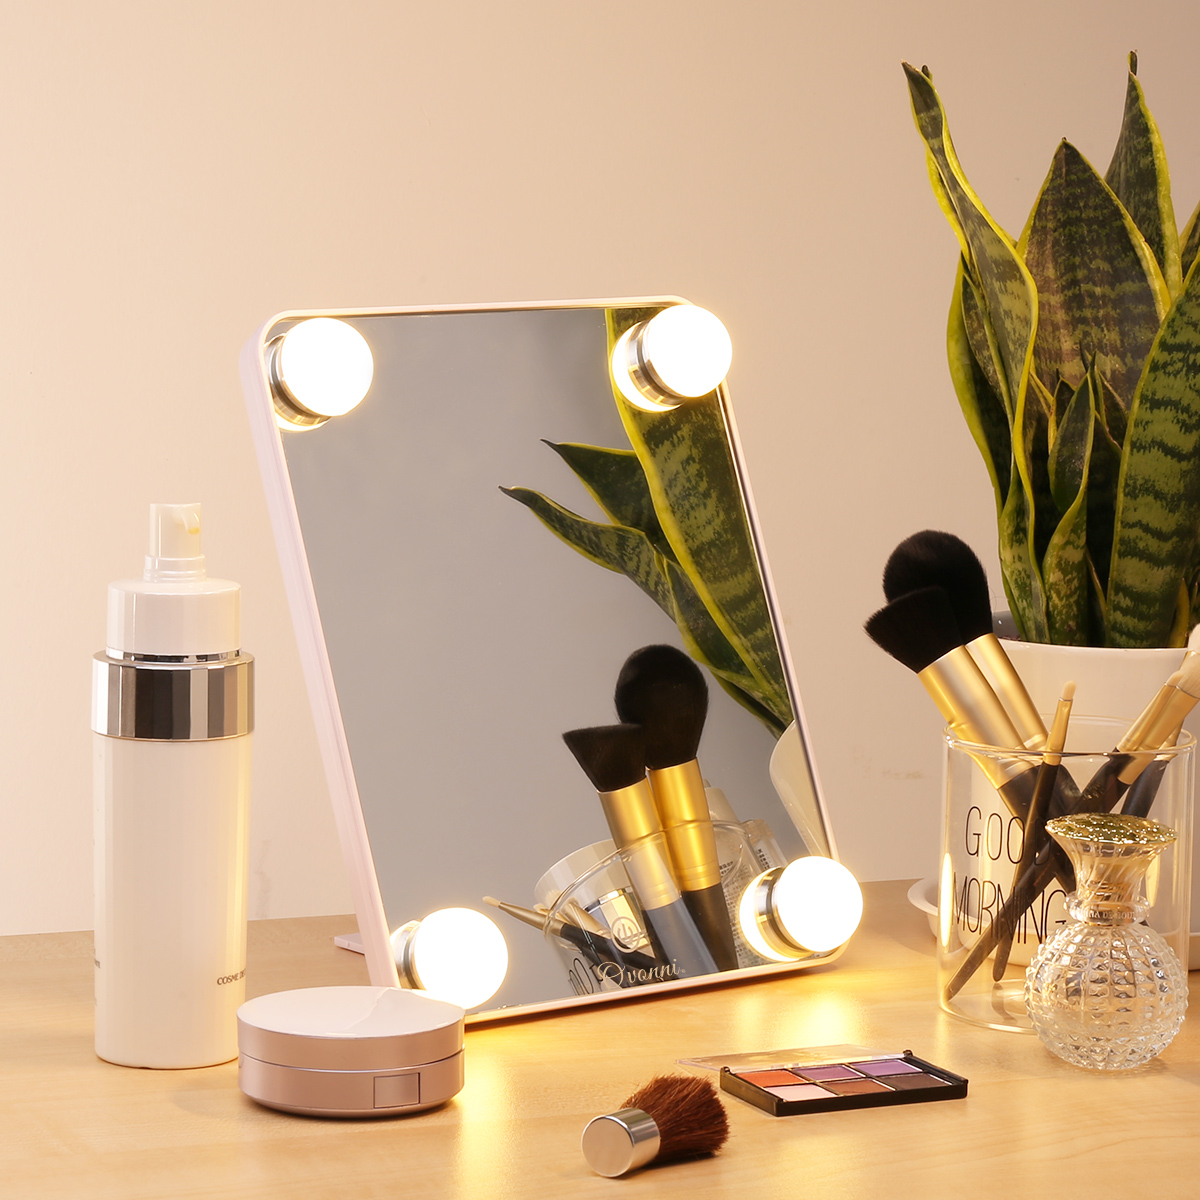 OVONNI KW035-2 USB Power Led Bulb Makeup Mirror with Energy Saving LEDbulbs